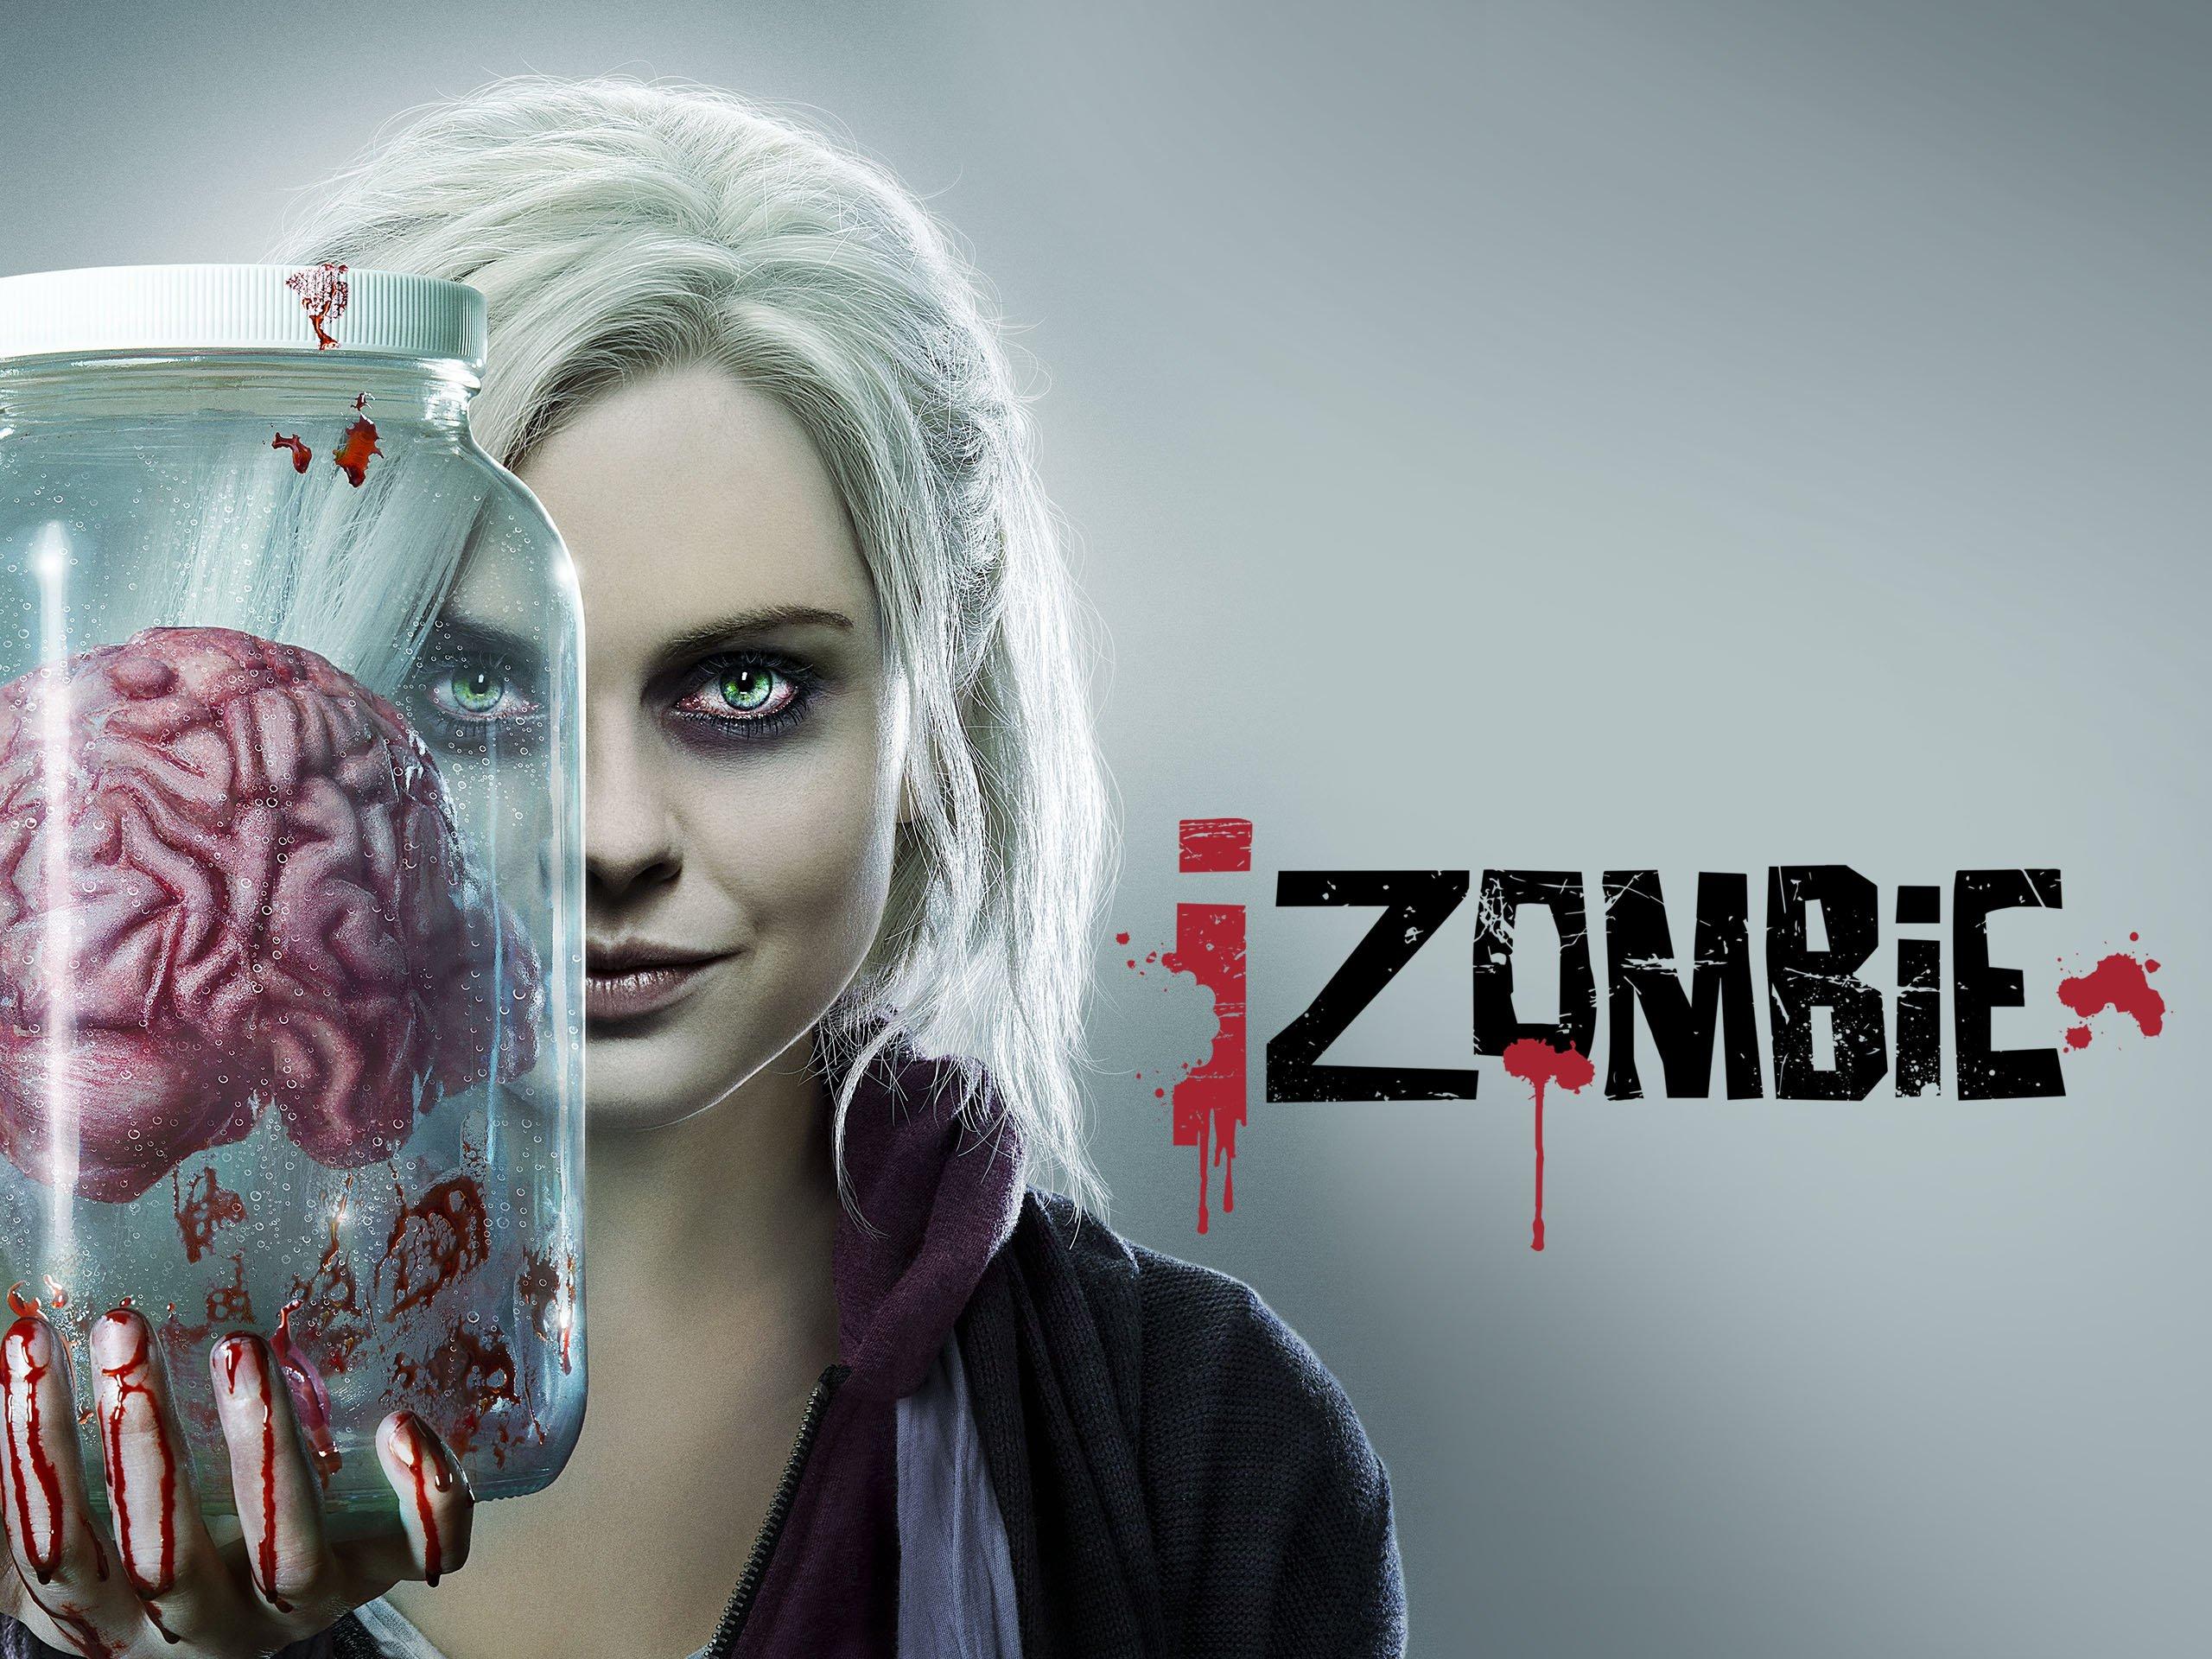 izombie season 1 episode 3 online free